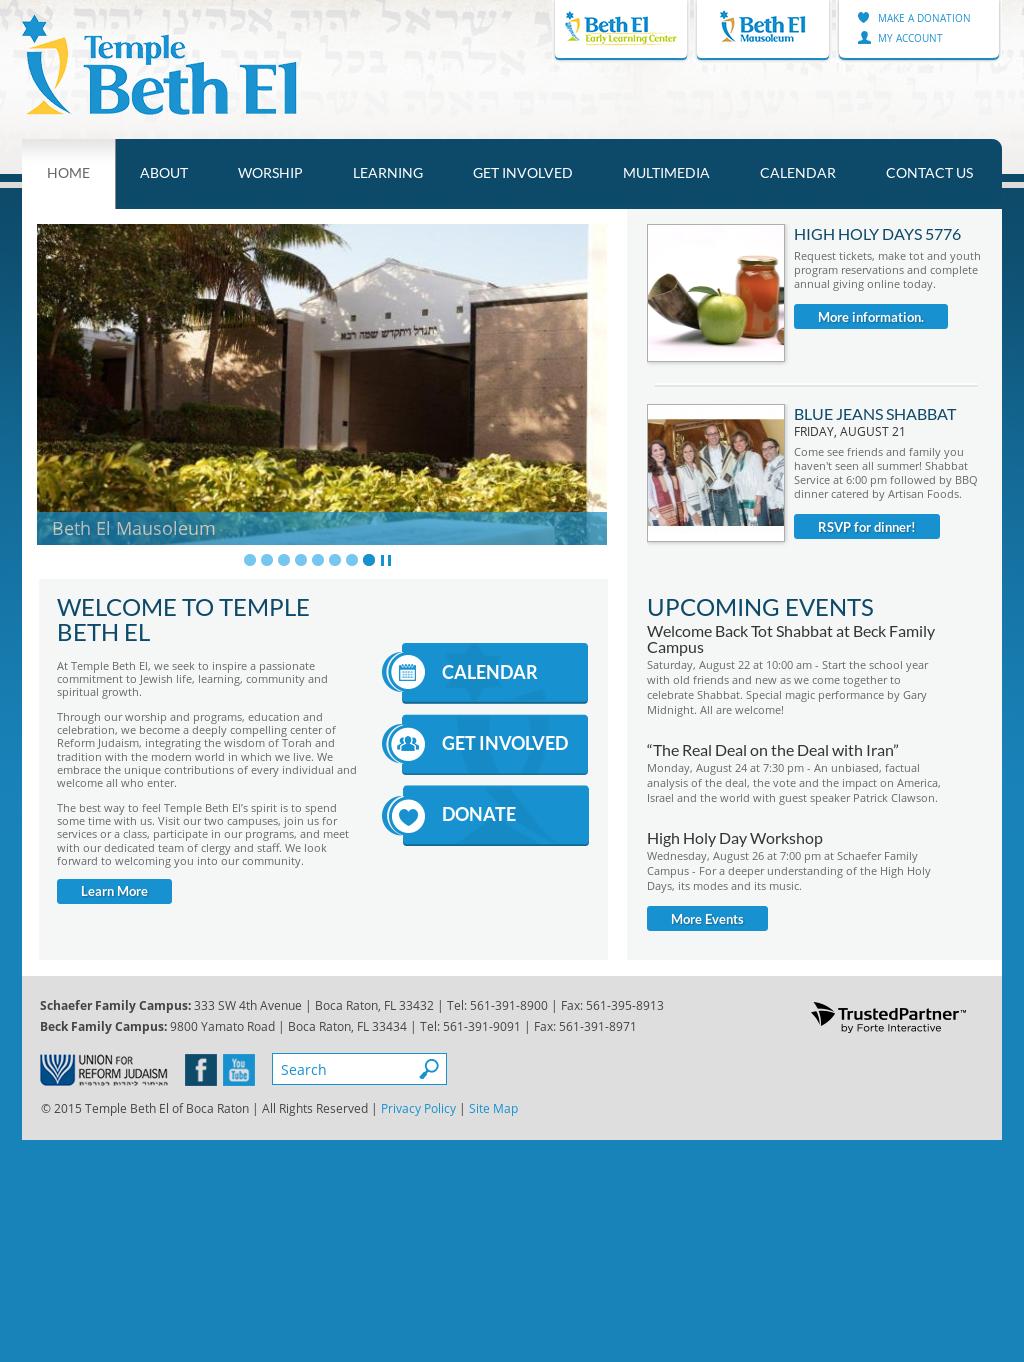 Temple Beth El Of Boca Raton Competitors, Revenue and